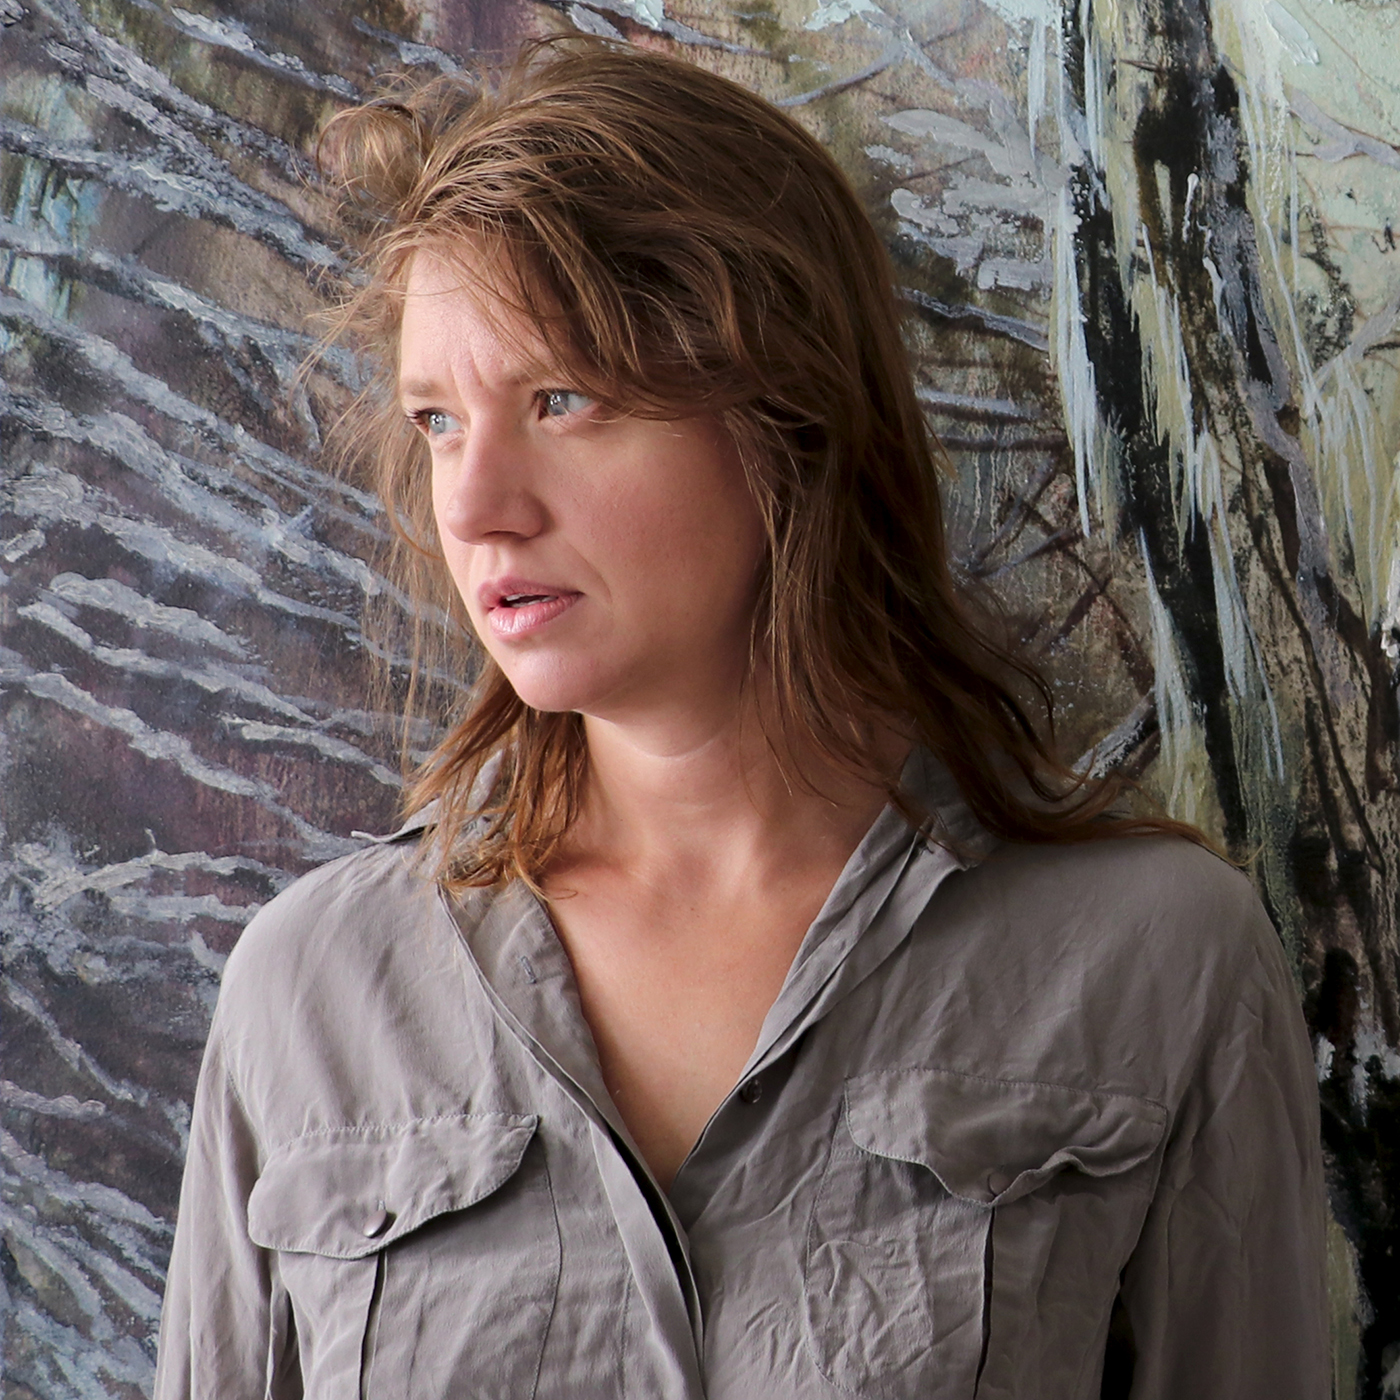 Sara-Vide Ericson. Hunter, gatherer, painter